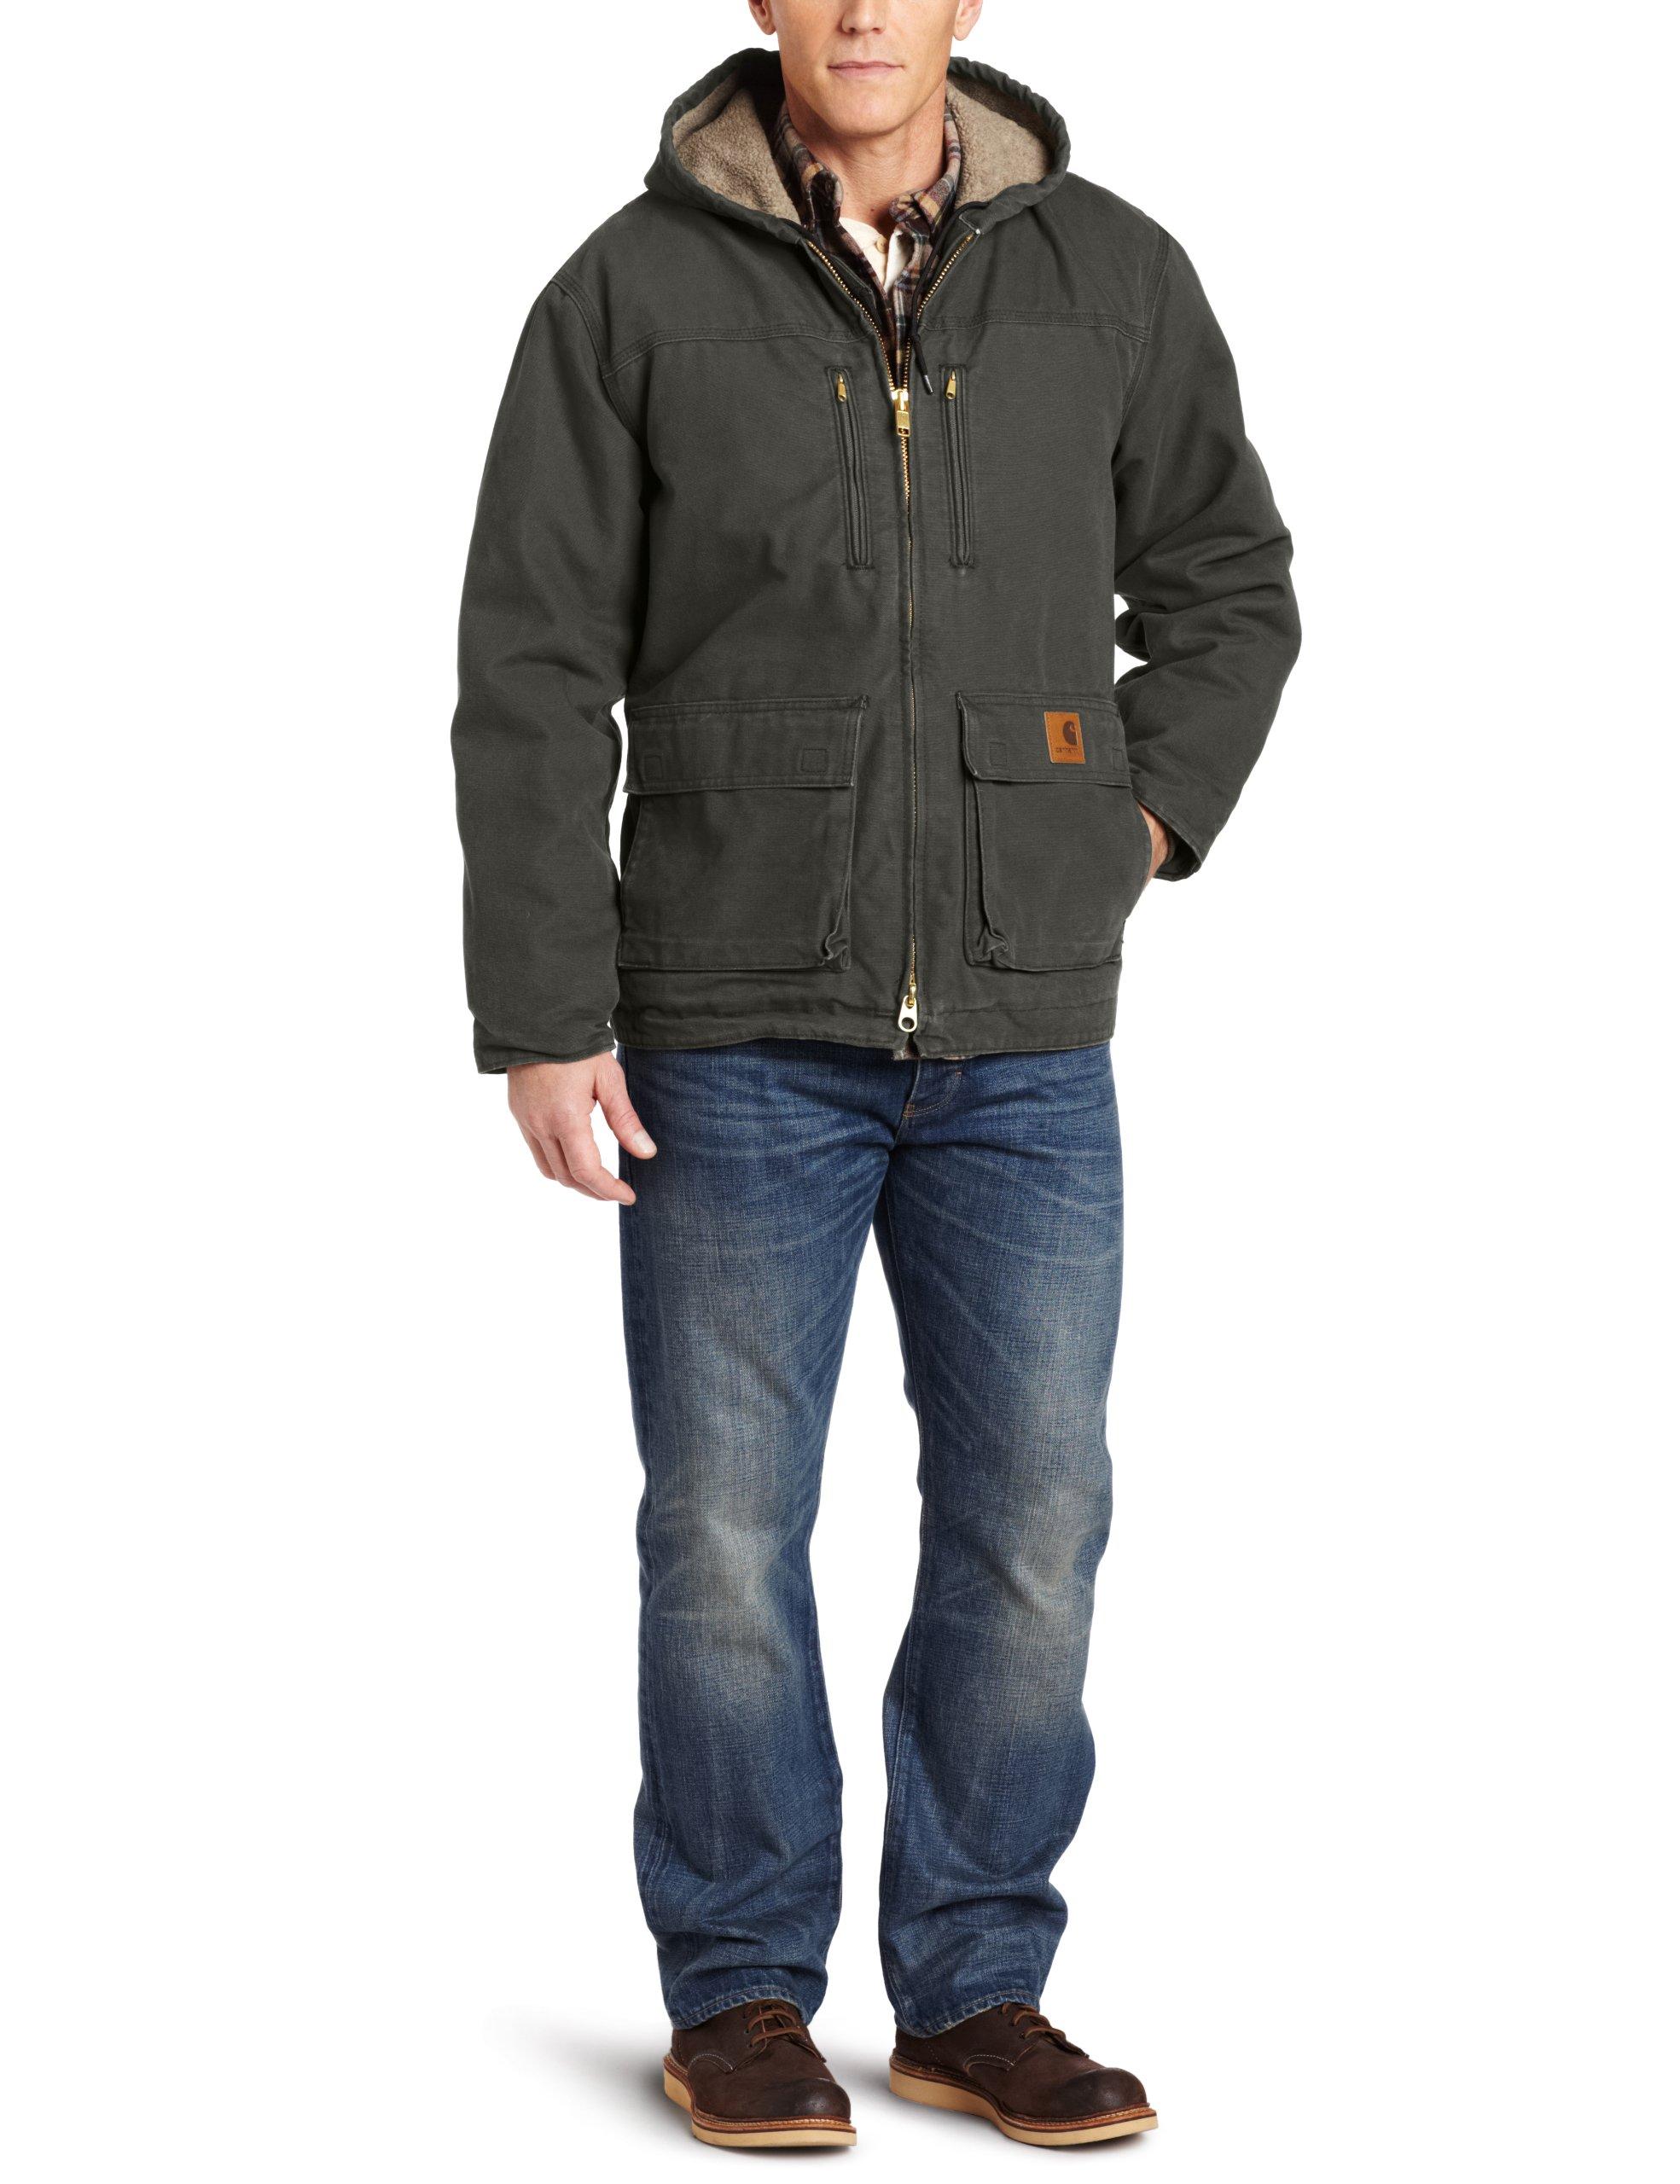 Carhartt Men's Jackson Coat Sherpa Lined Sandstone,Moss (Closeout),XX-Large